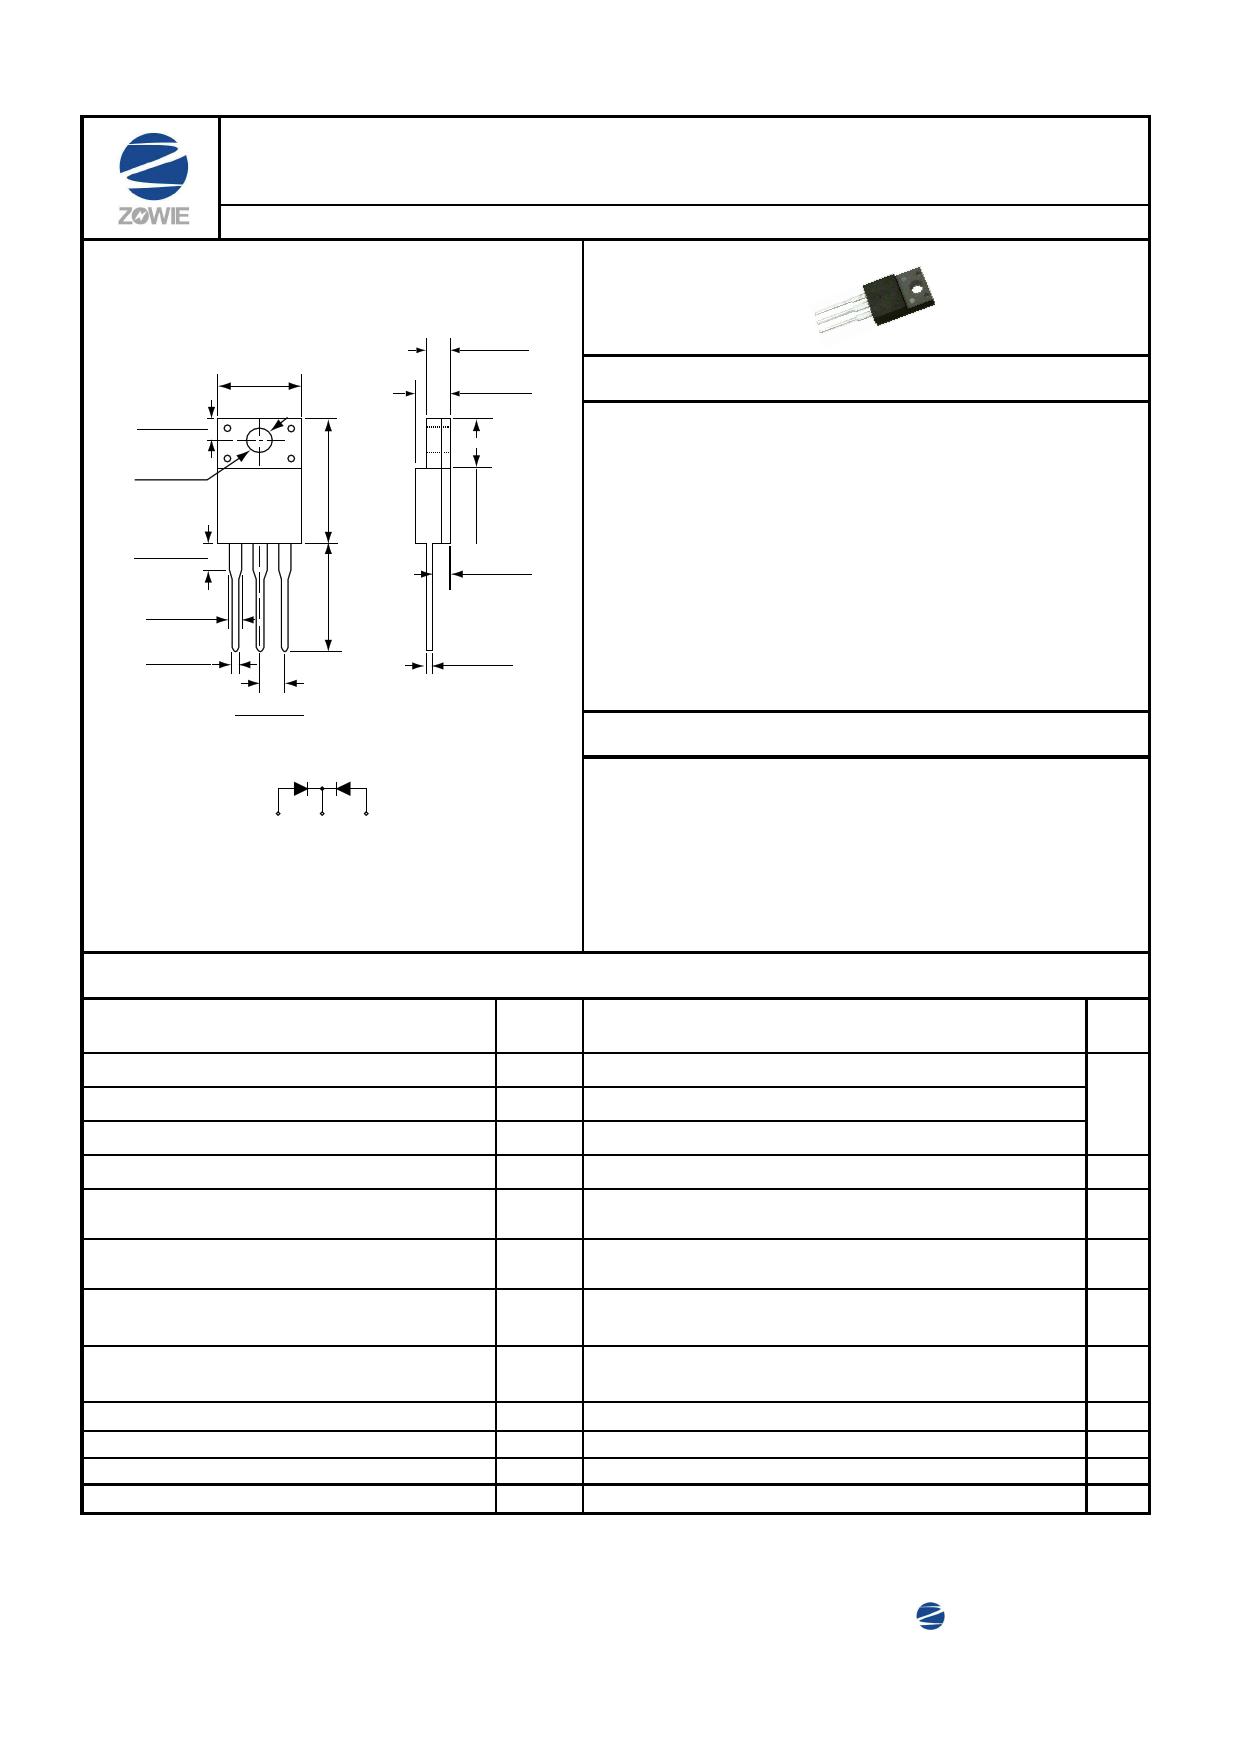 MBR10150CFSH Datasheet, MBR10150CFSH PDF,ピン配置, 機能